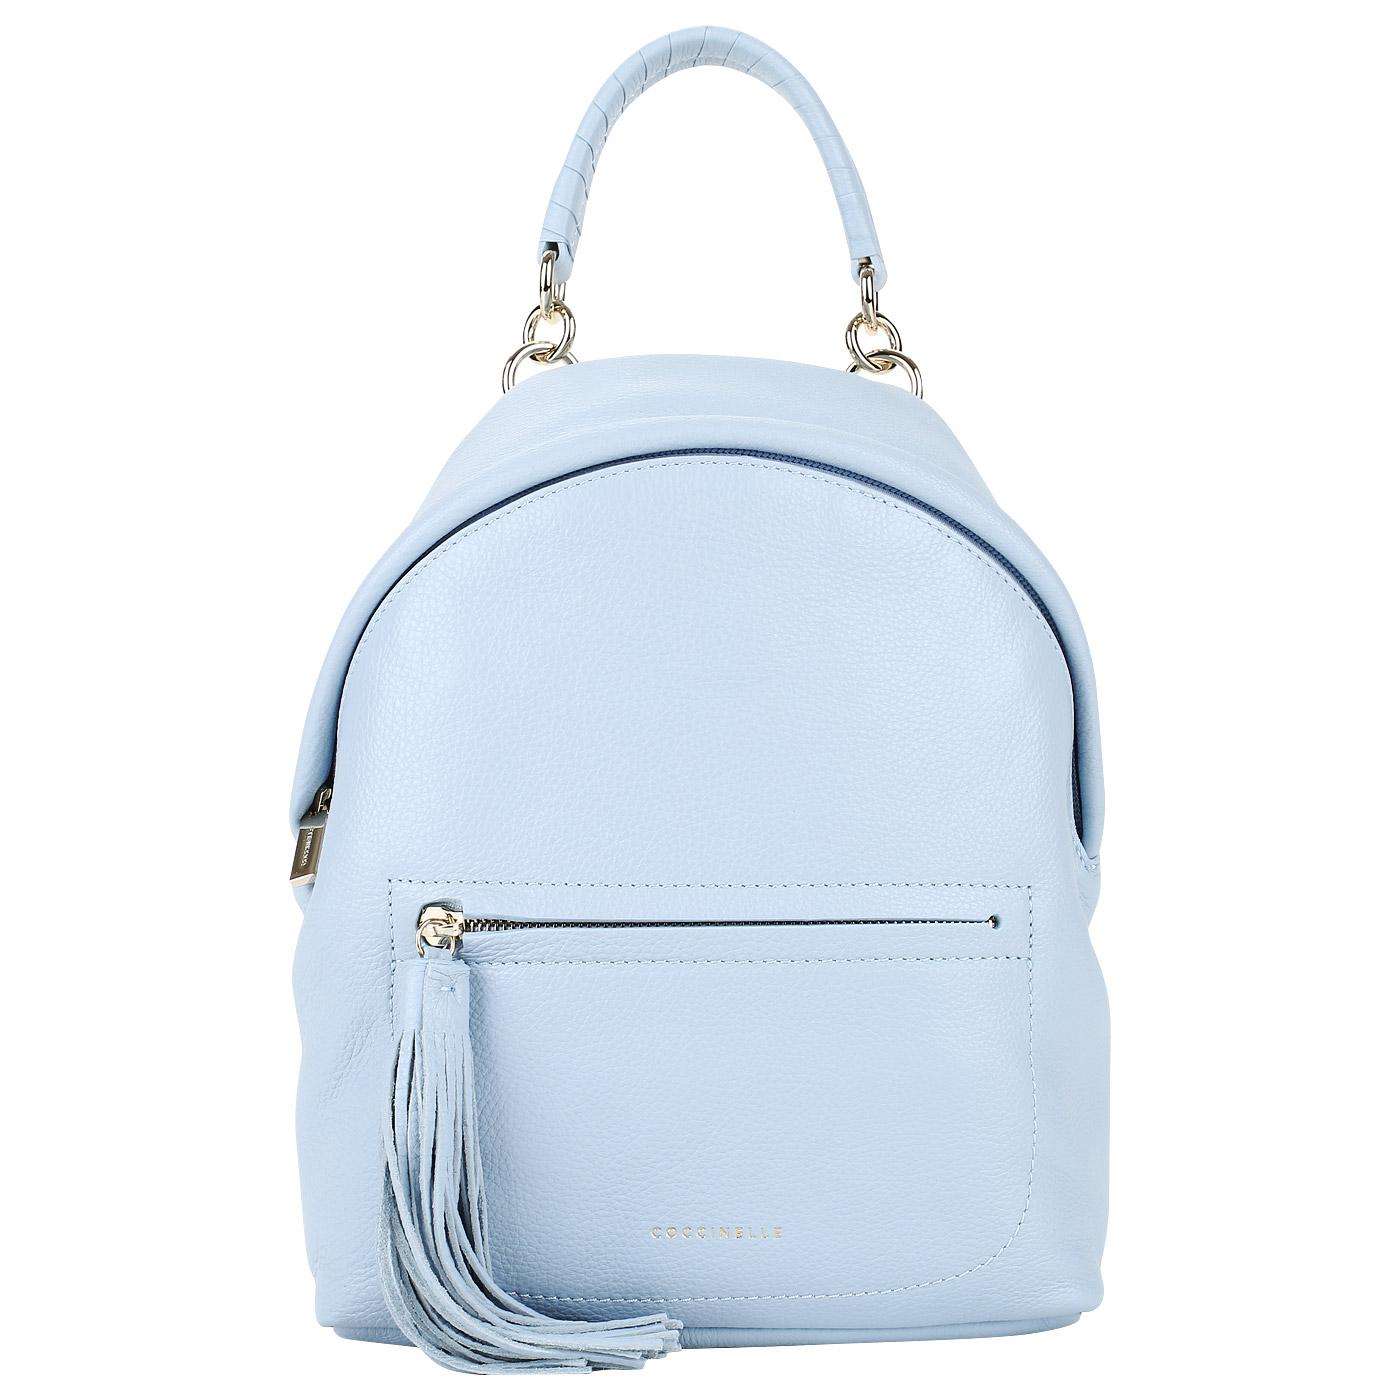 2ac73bda259f Компактный женский рюкзак Coccinelle Leonie Компактный женский рюкзак  Coccinelle Leonie ...